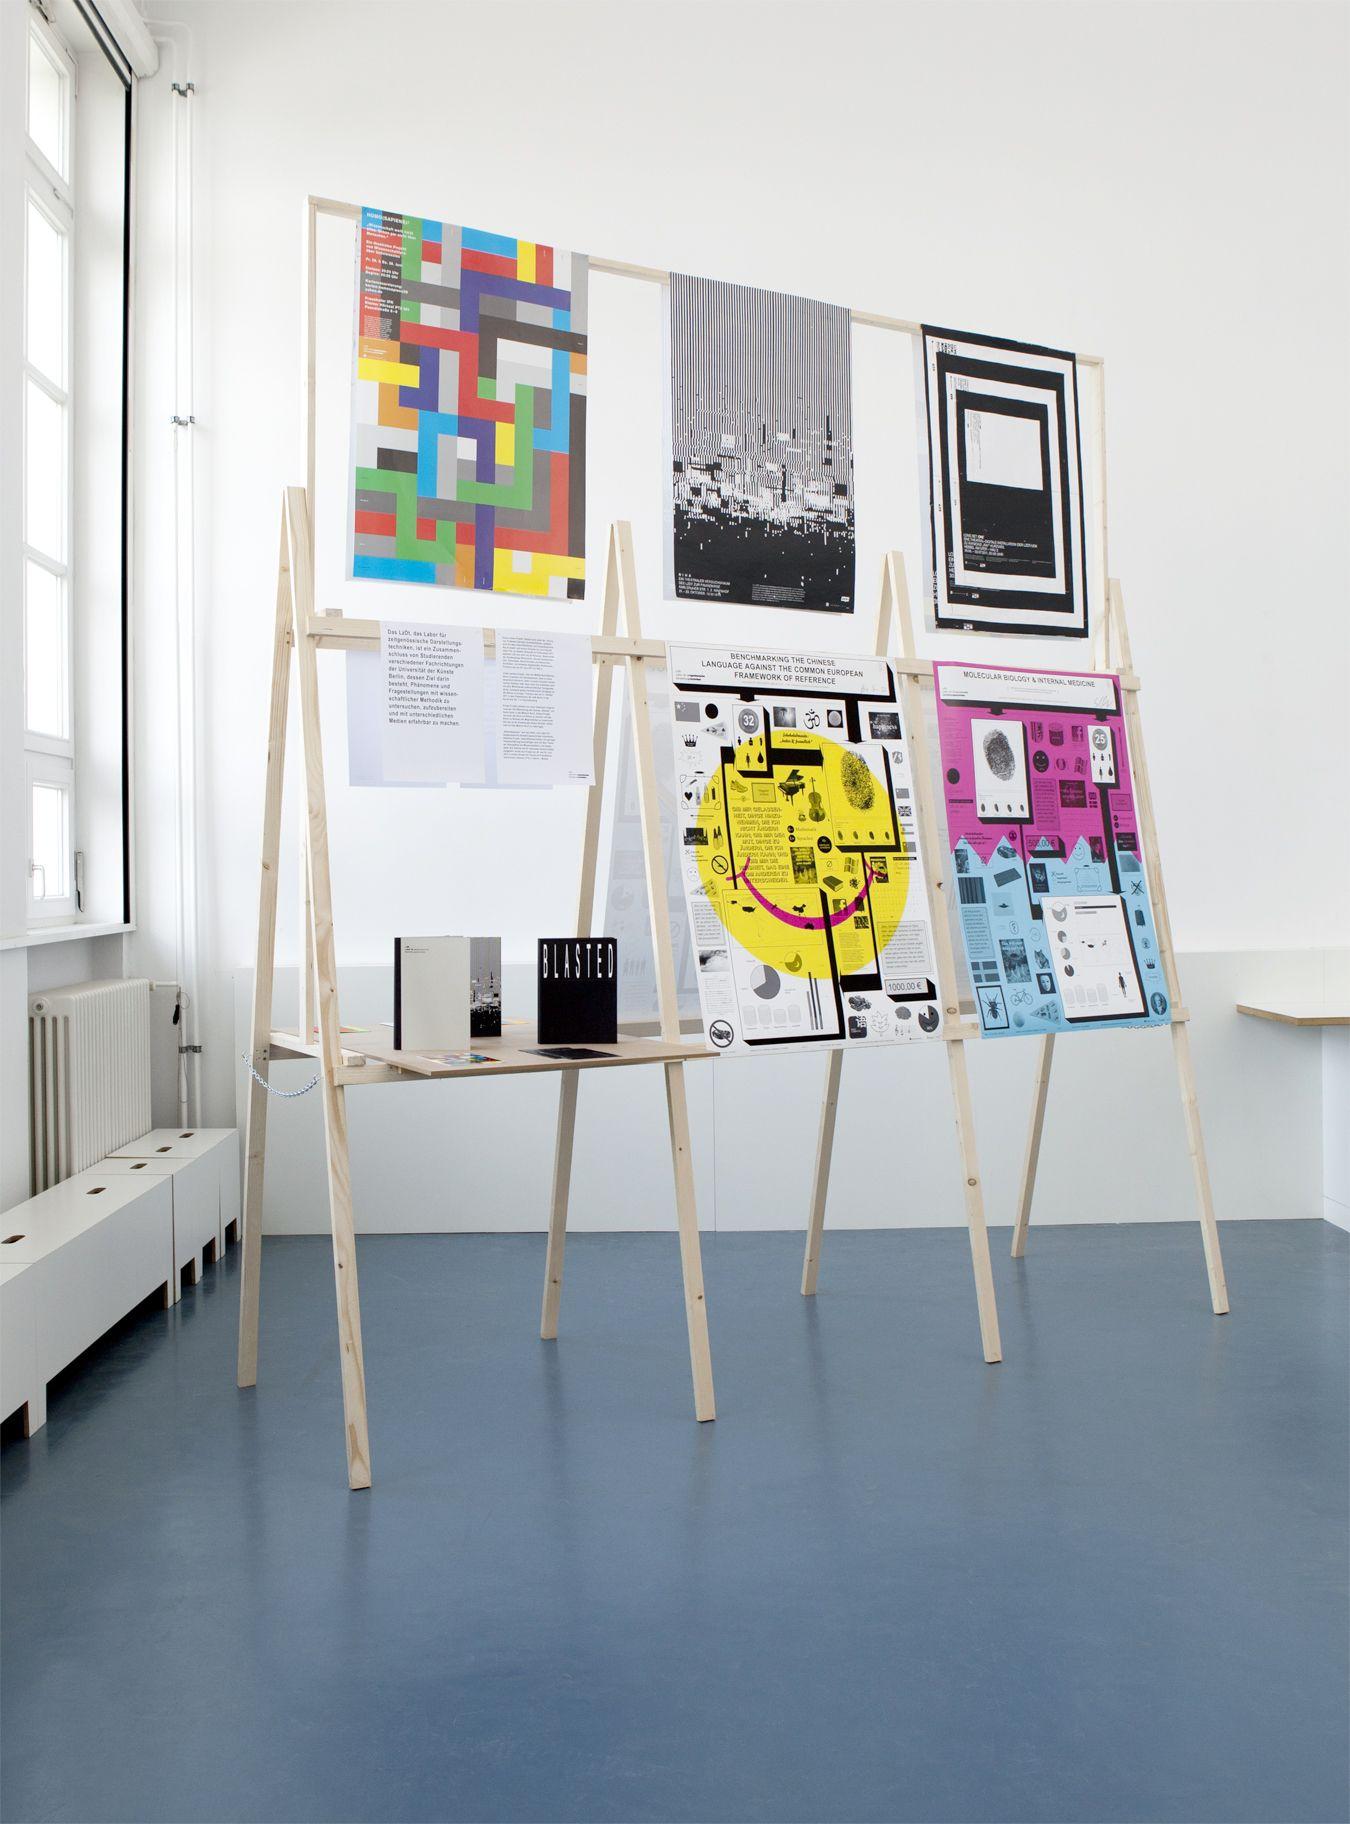 Lzdt Johannes Ammler Windows Concept Ideas Ausstellungsraum Messestand Design Und Mobiler